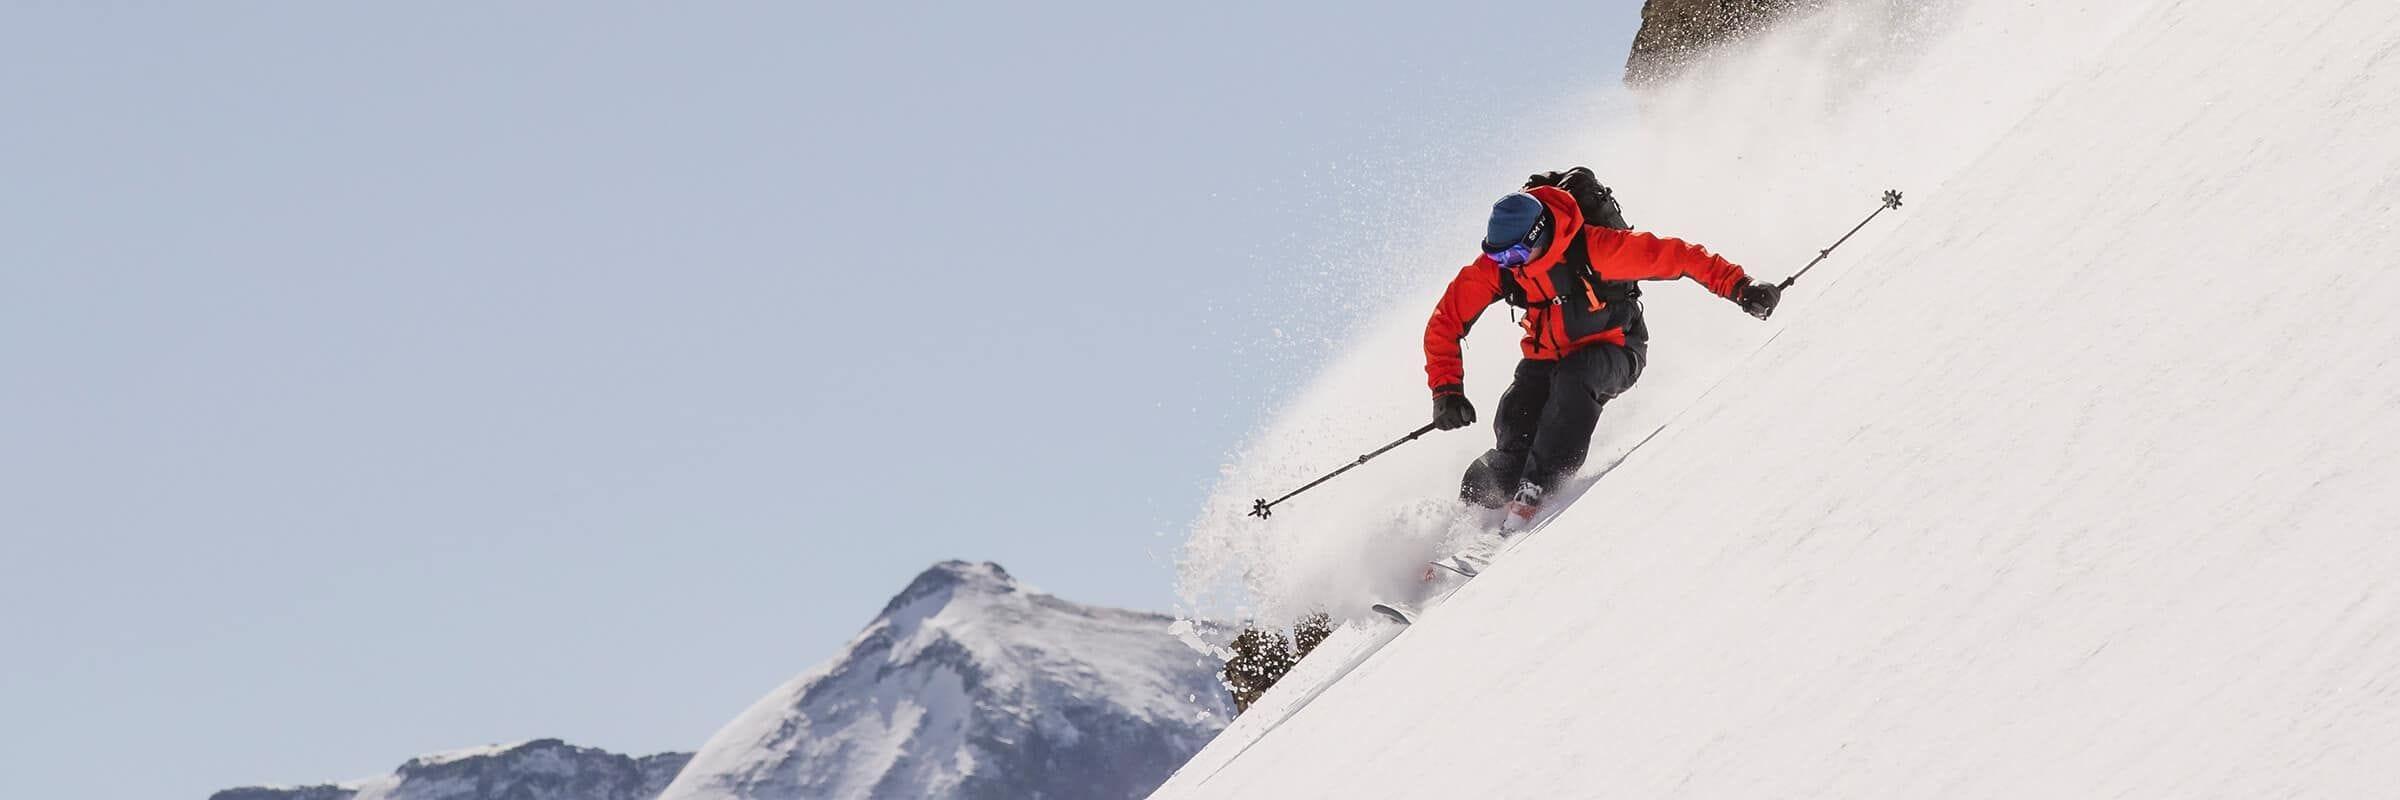 Best Ski Pants & Bibs for Winter 2021